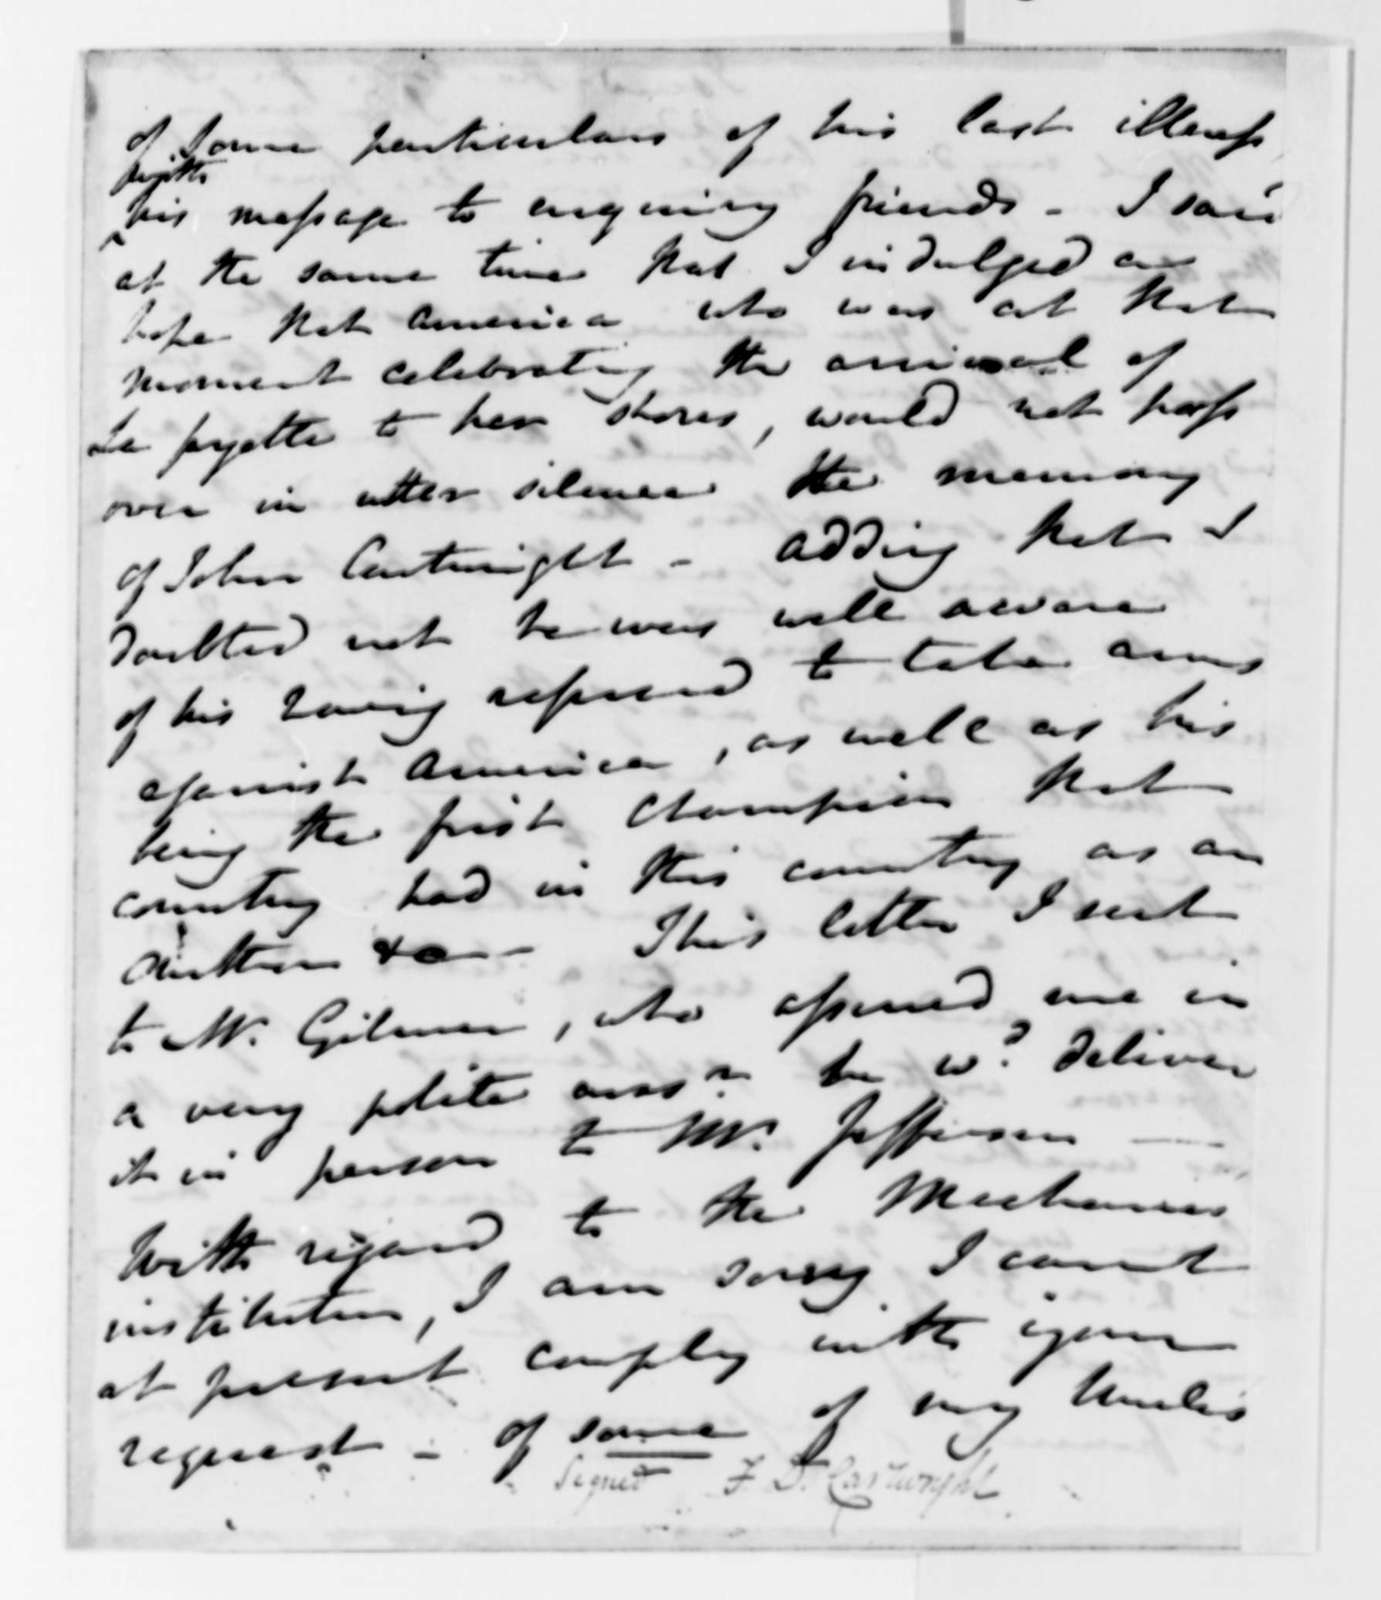 Frances D. Cartwright to John B. Gilchrist, November 1, 1824